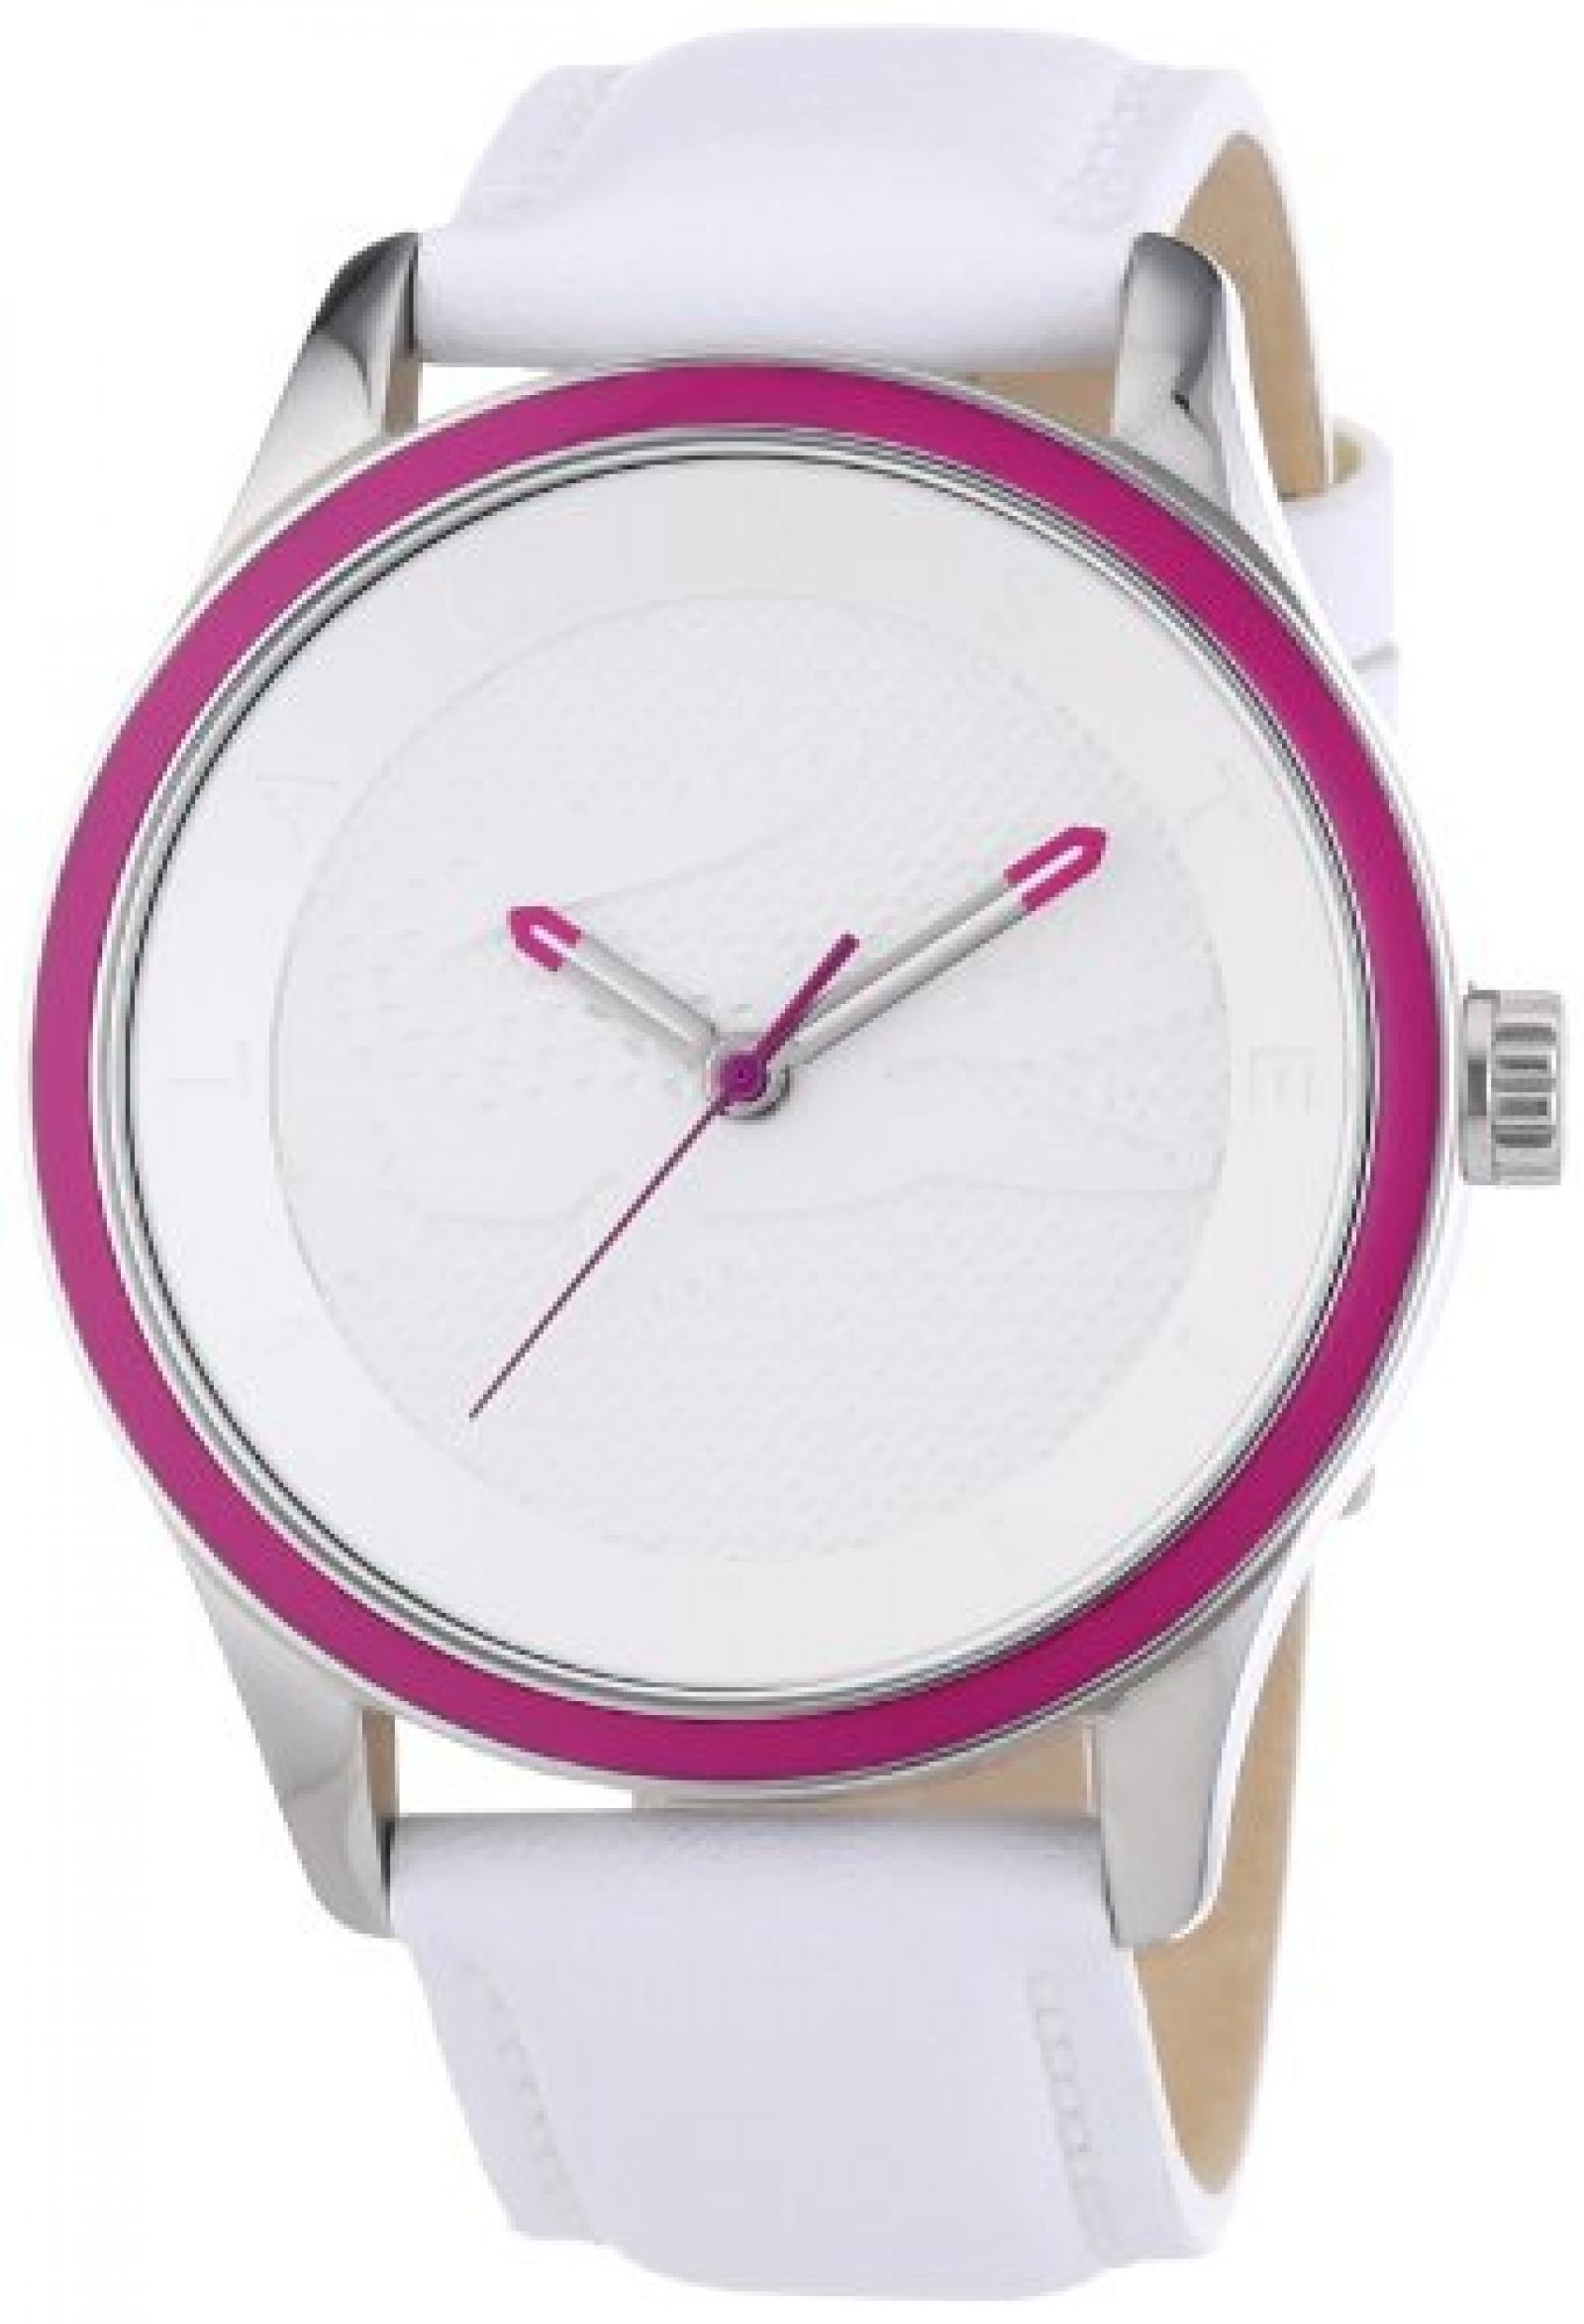 Lacoste Damen-Armbanduhr Victoria Analog Quarz Leder 2000818